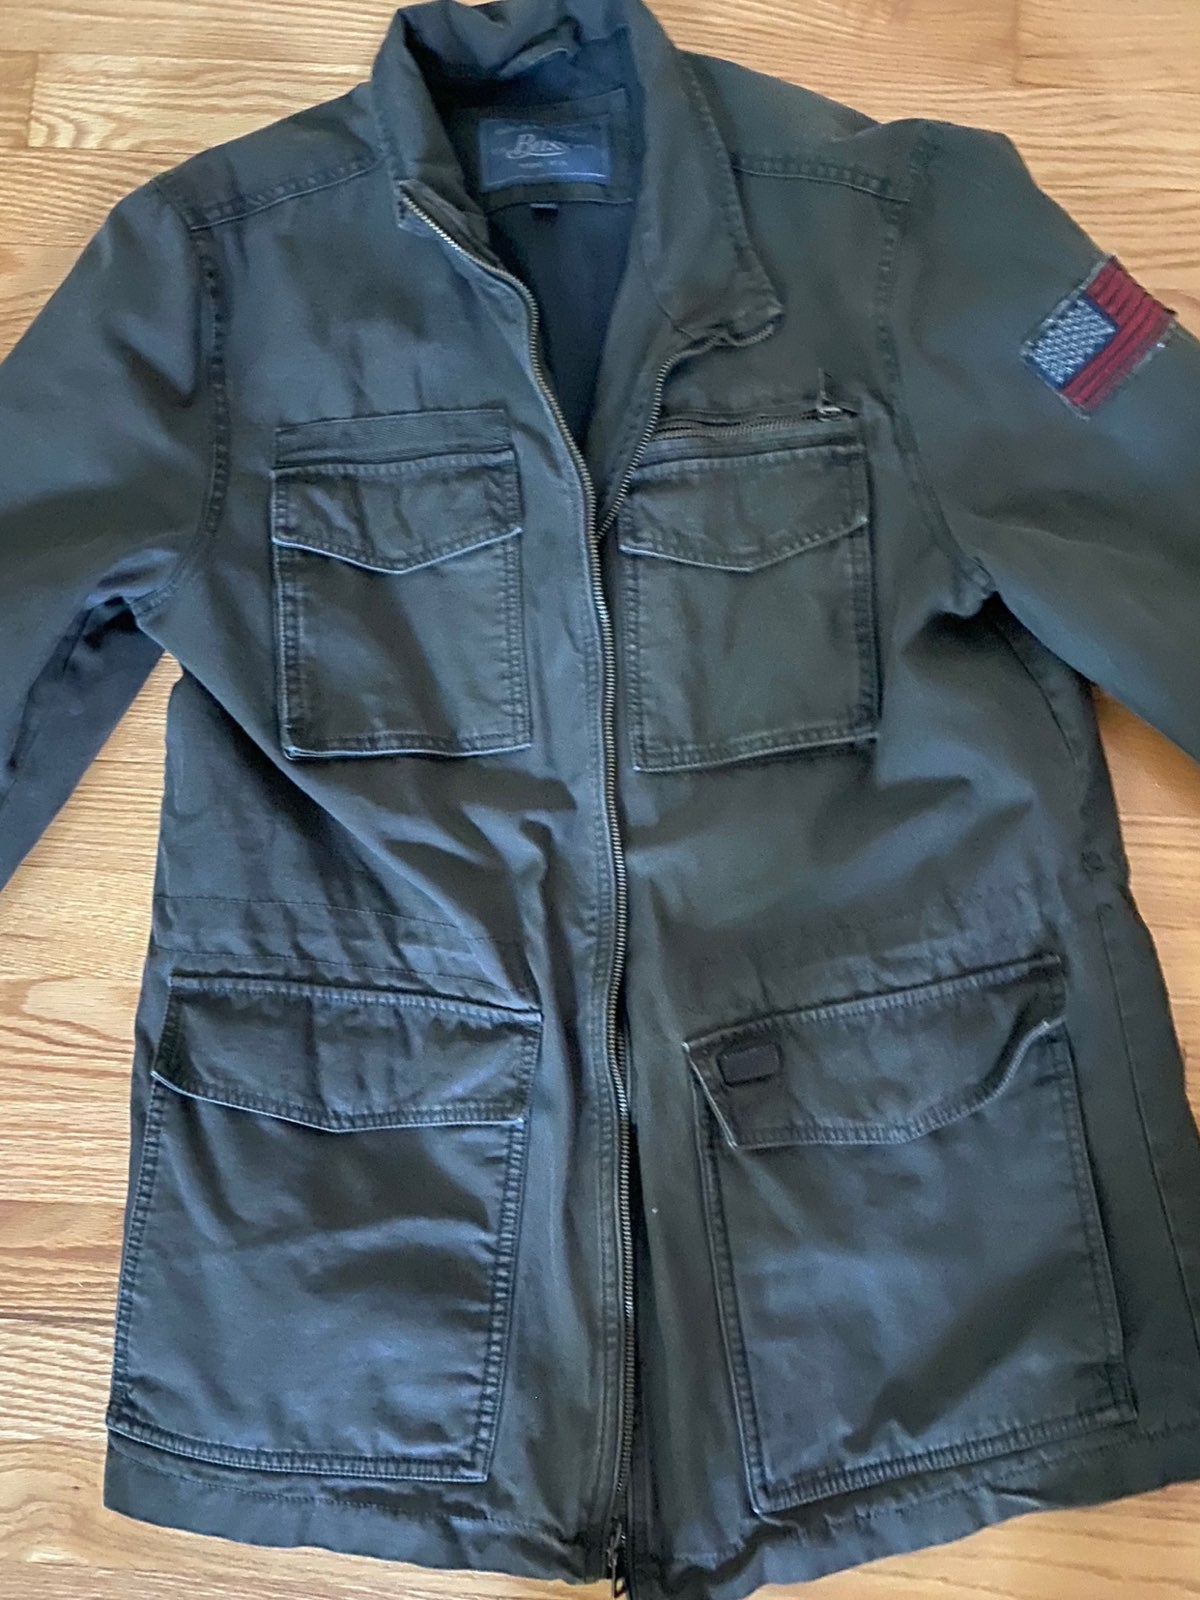 Bass army green Jacket